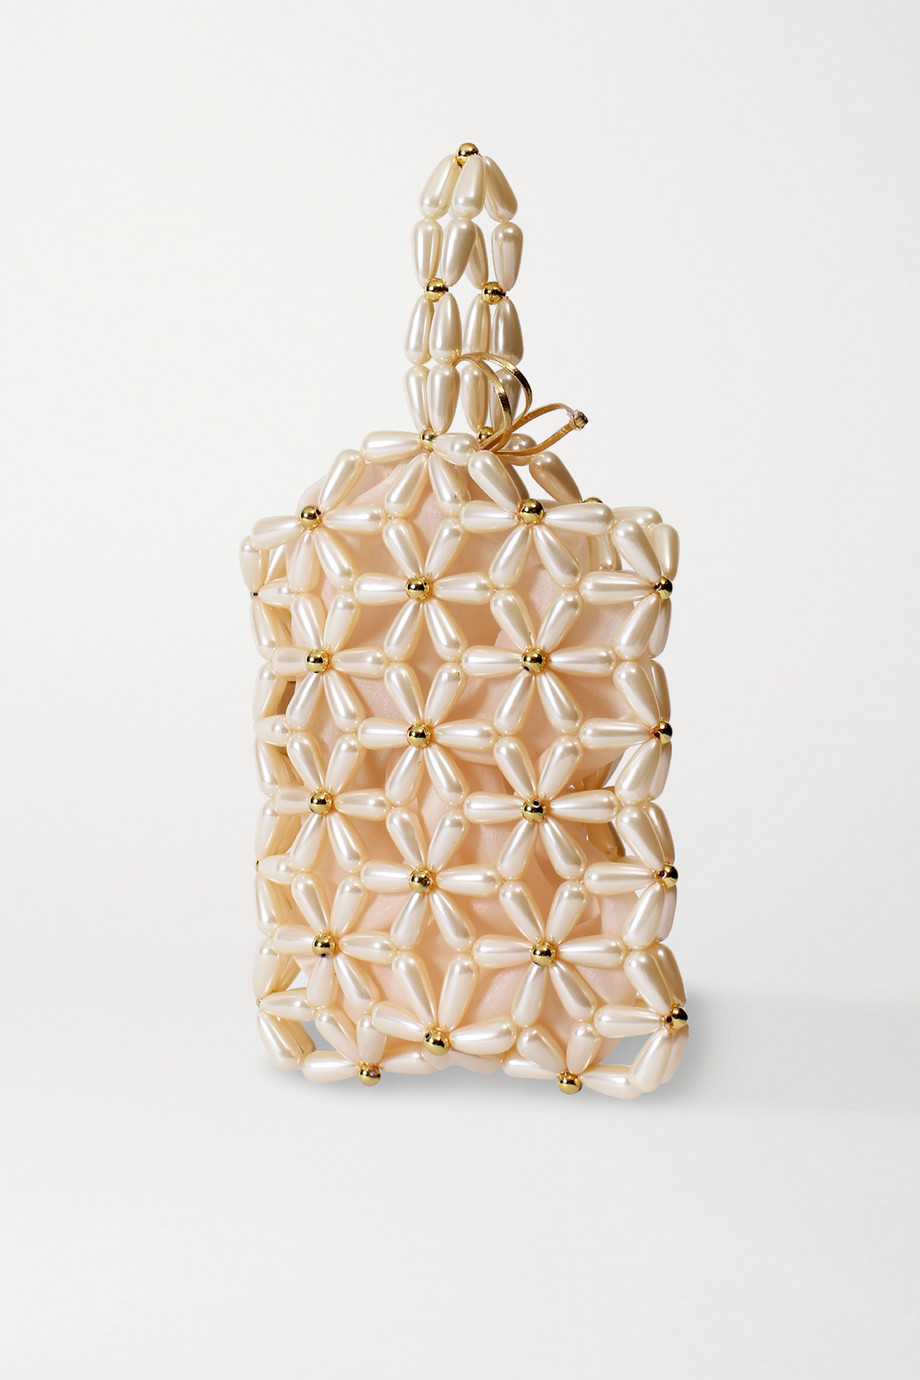 Vanina Daisy 人造珍珠金色手提包